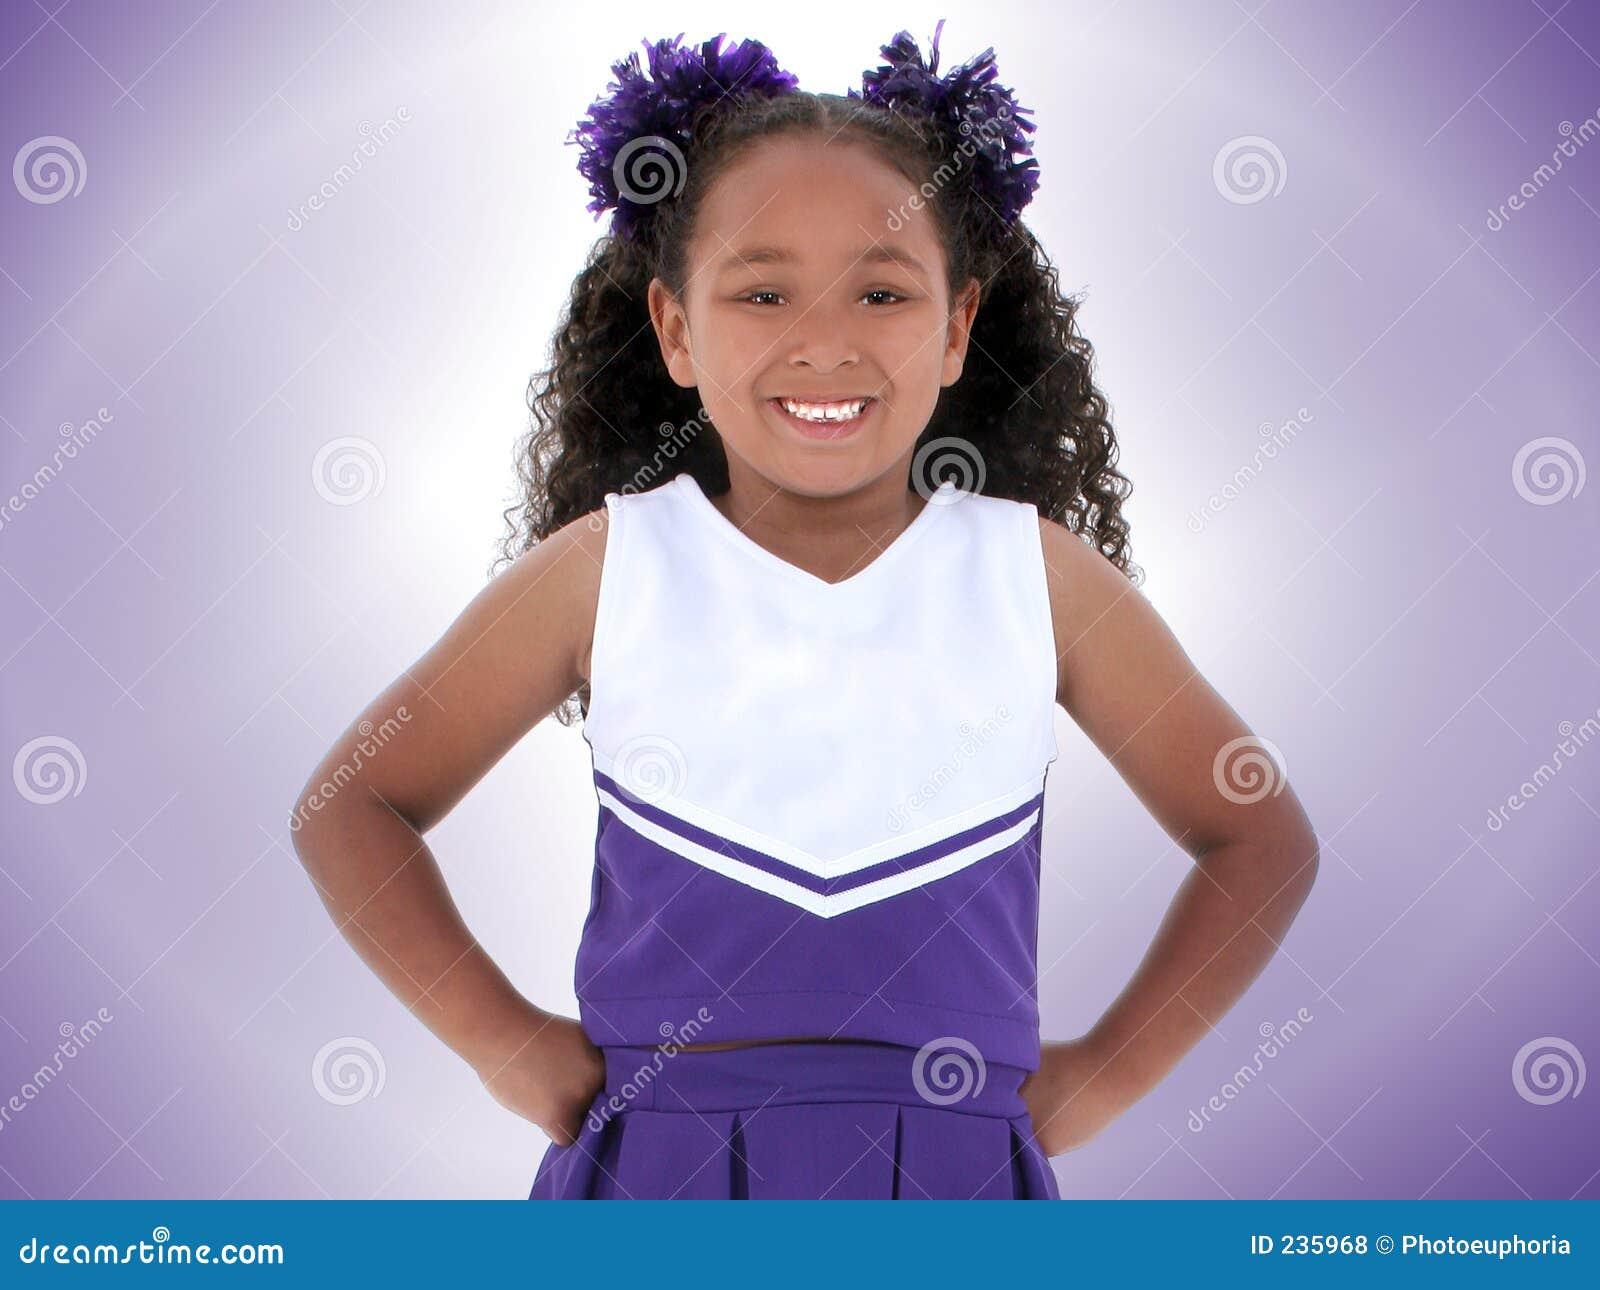 Beautiful Six Year Old Cheerleader Over Purple